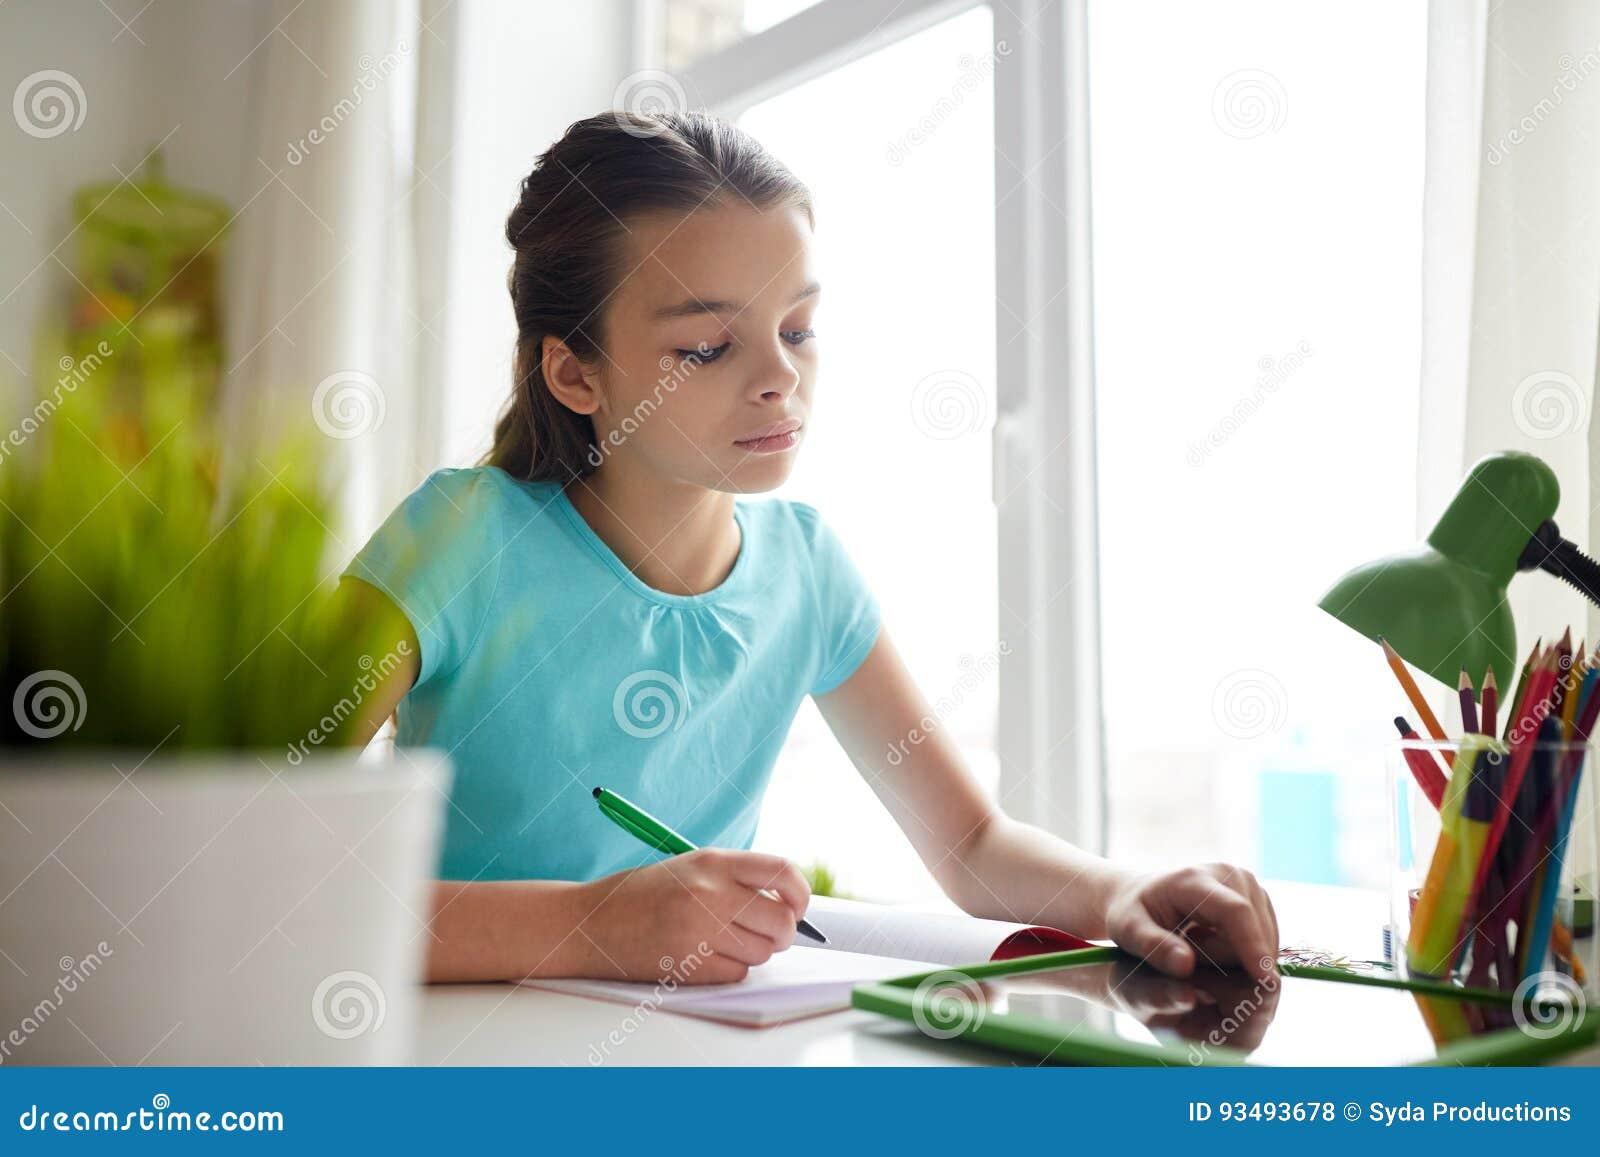 writing essay application www ielts samples